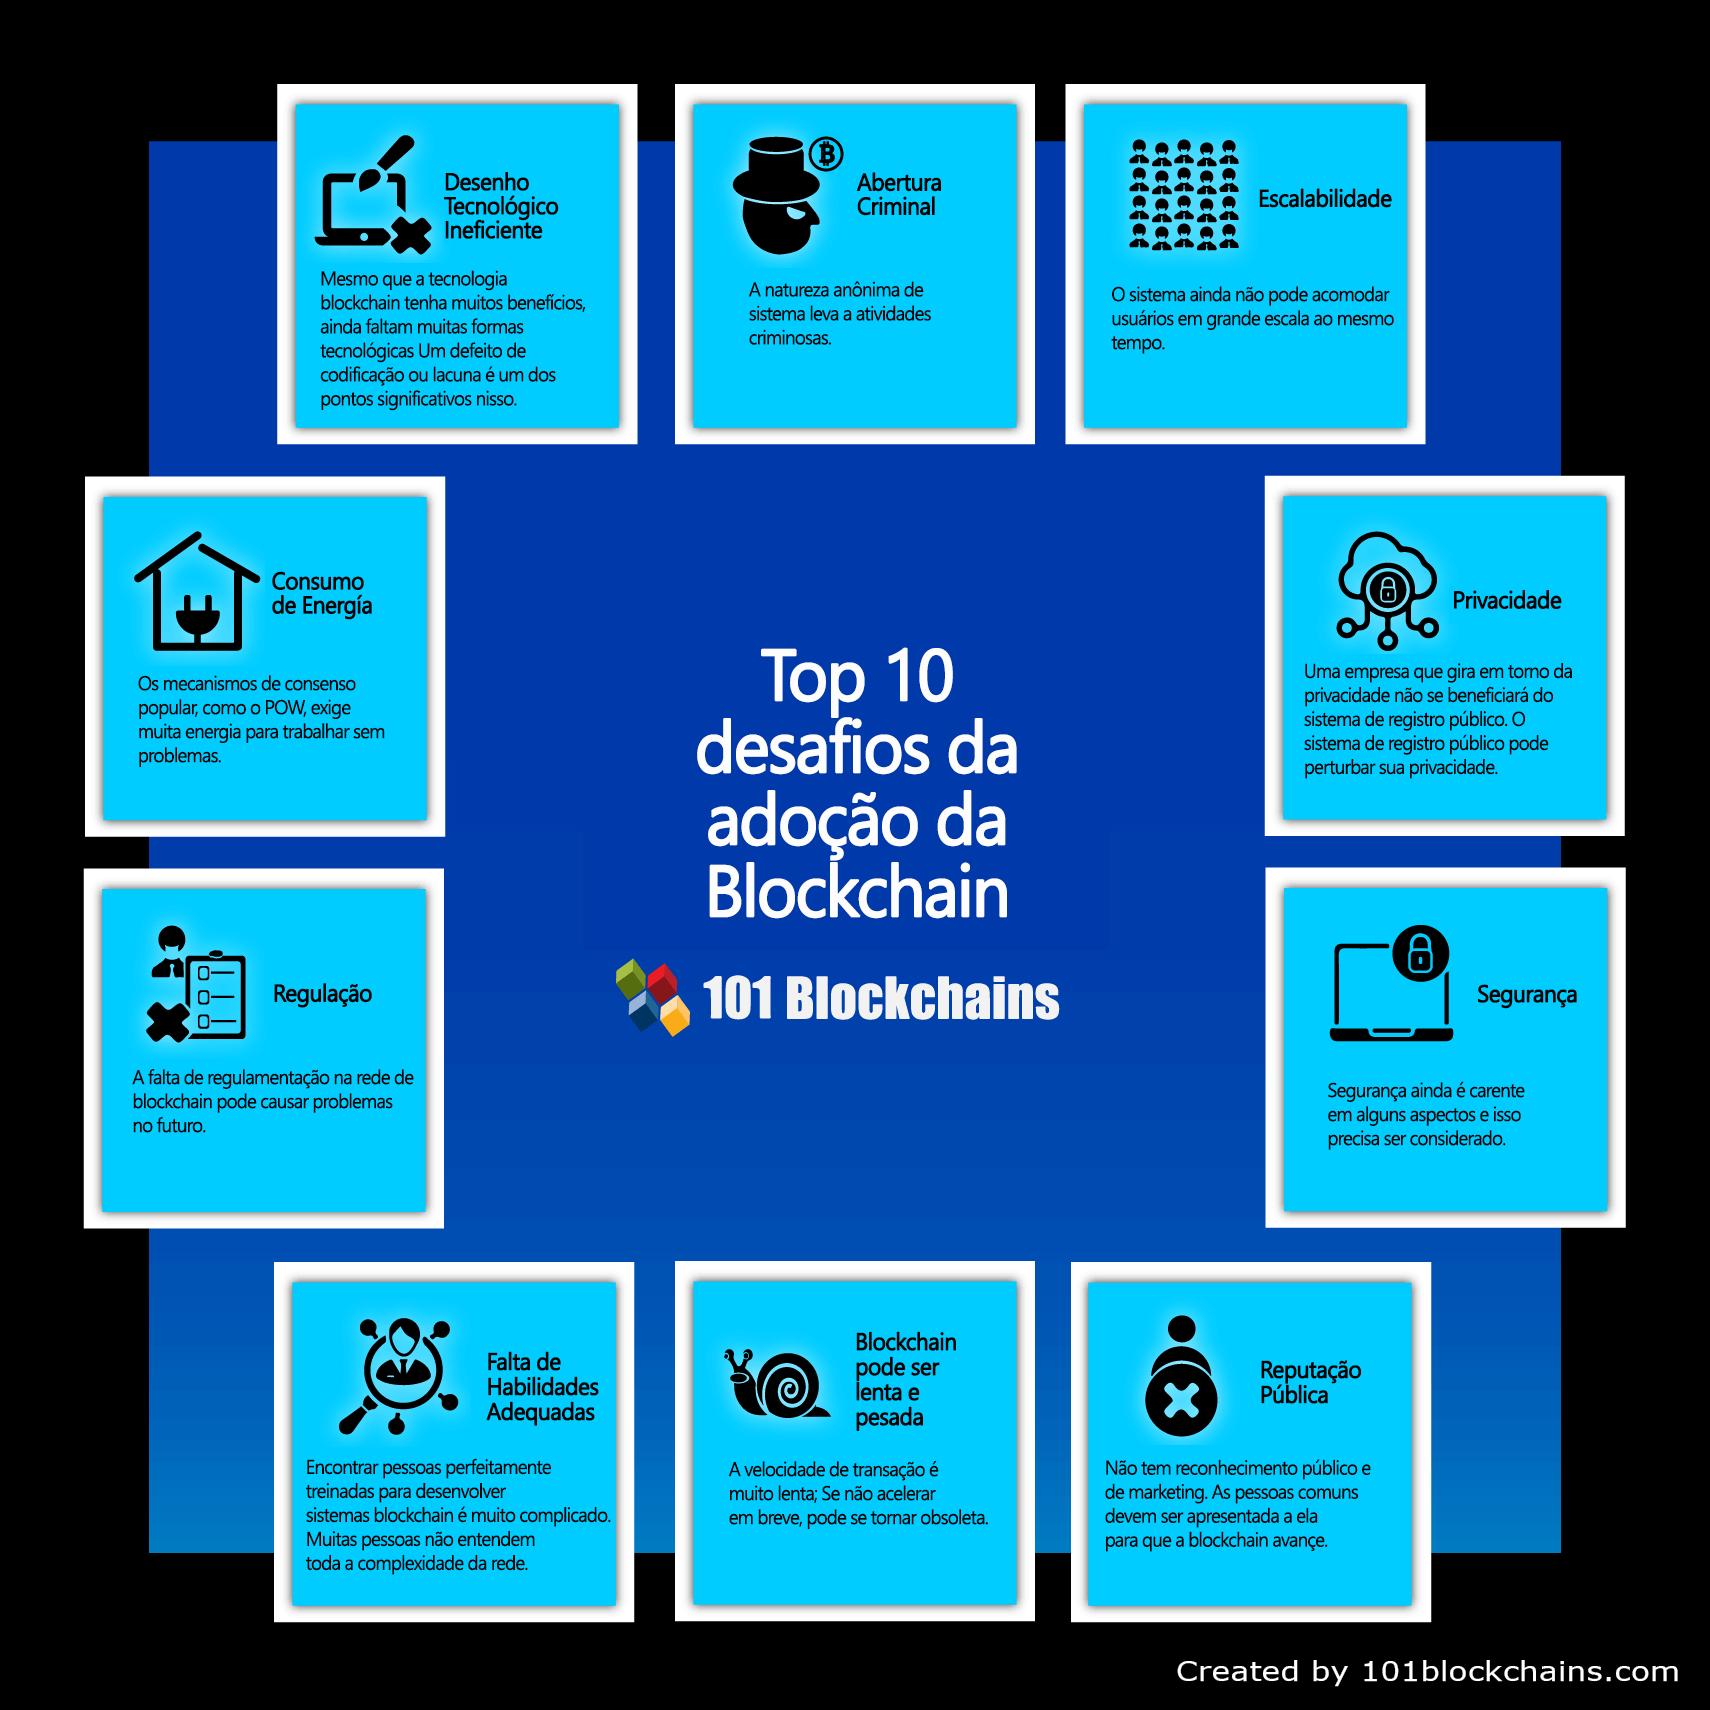 top 10 desafios da adoç¦o da blockchain